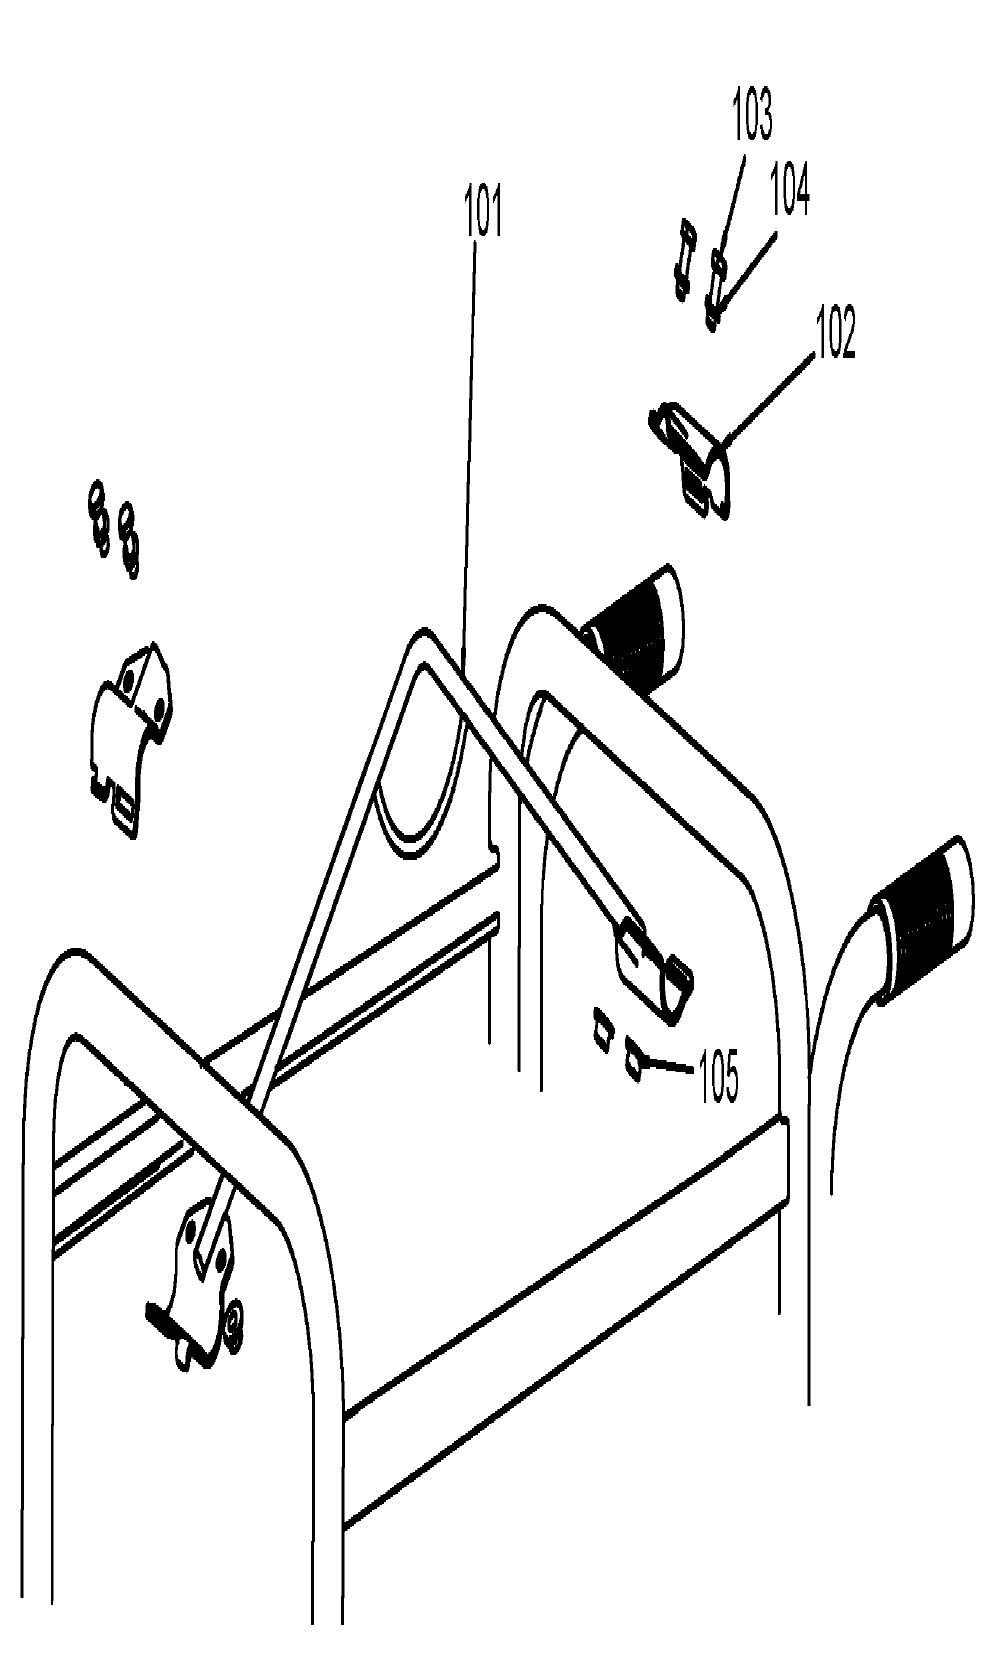 H451CS-W-Portercable-PB-4Break Down